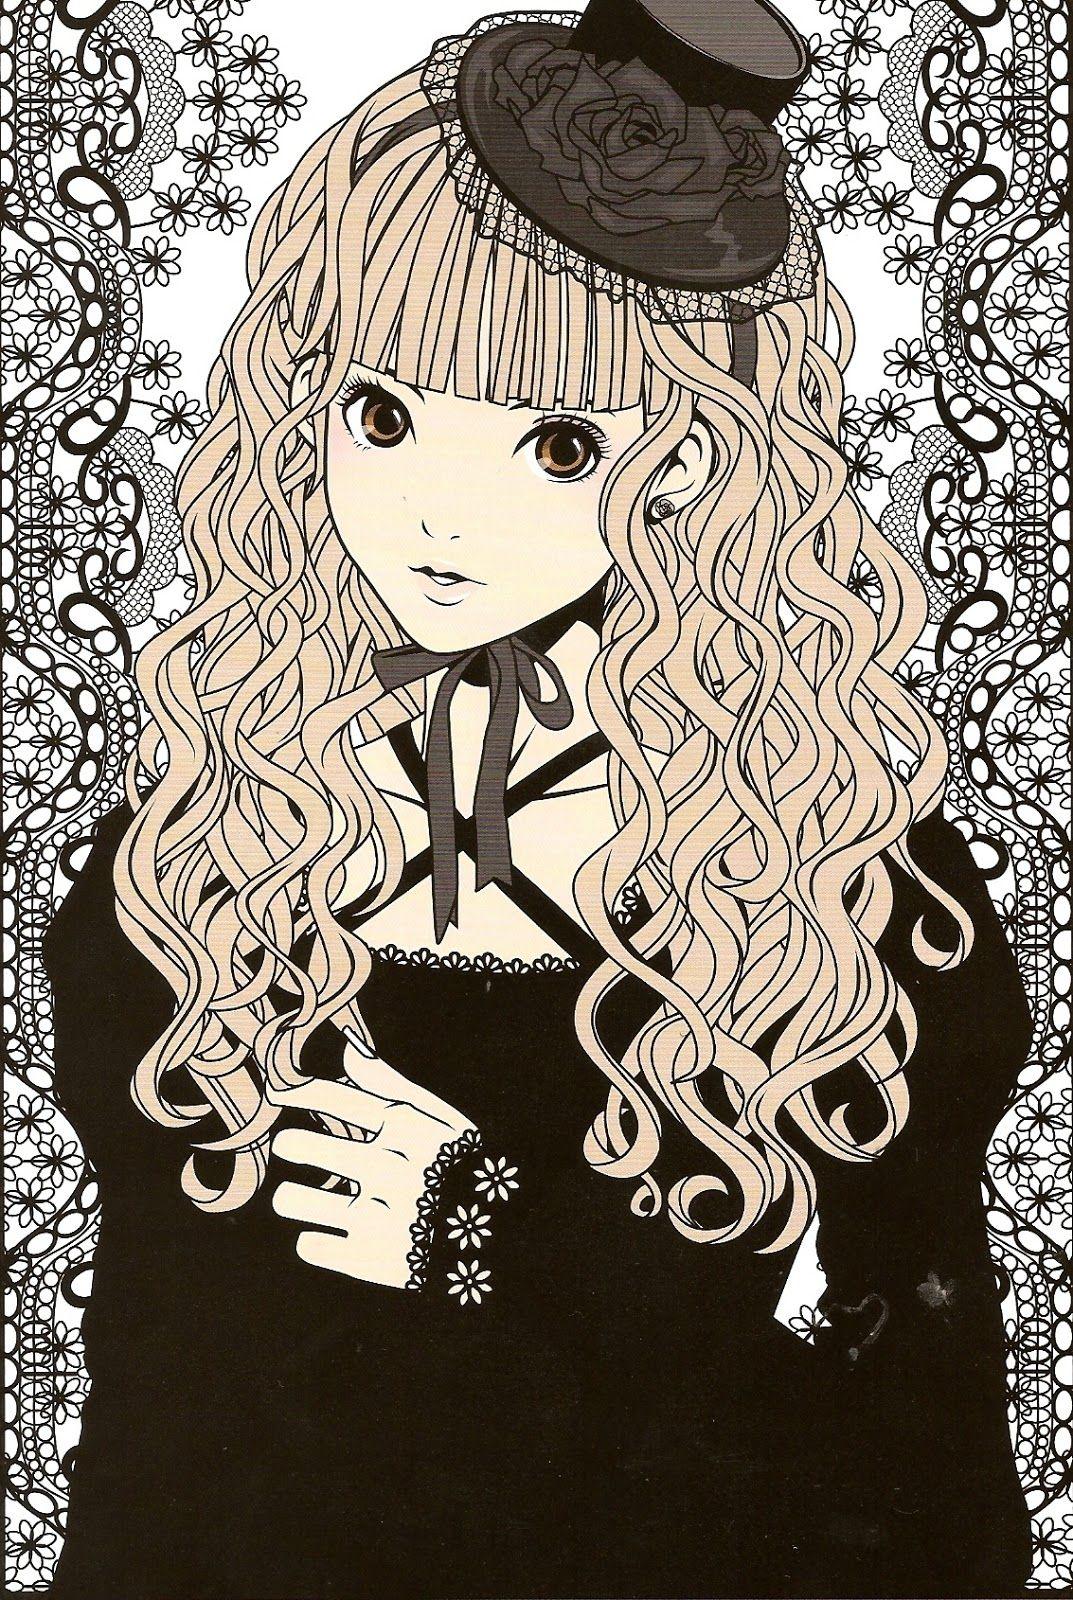 Eri kamijo业条衿 kai fine art アートのアイデア キュートなアート ポストカード